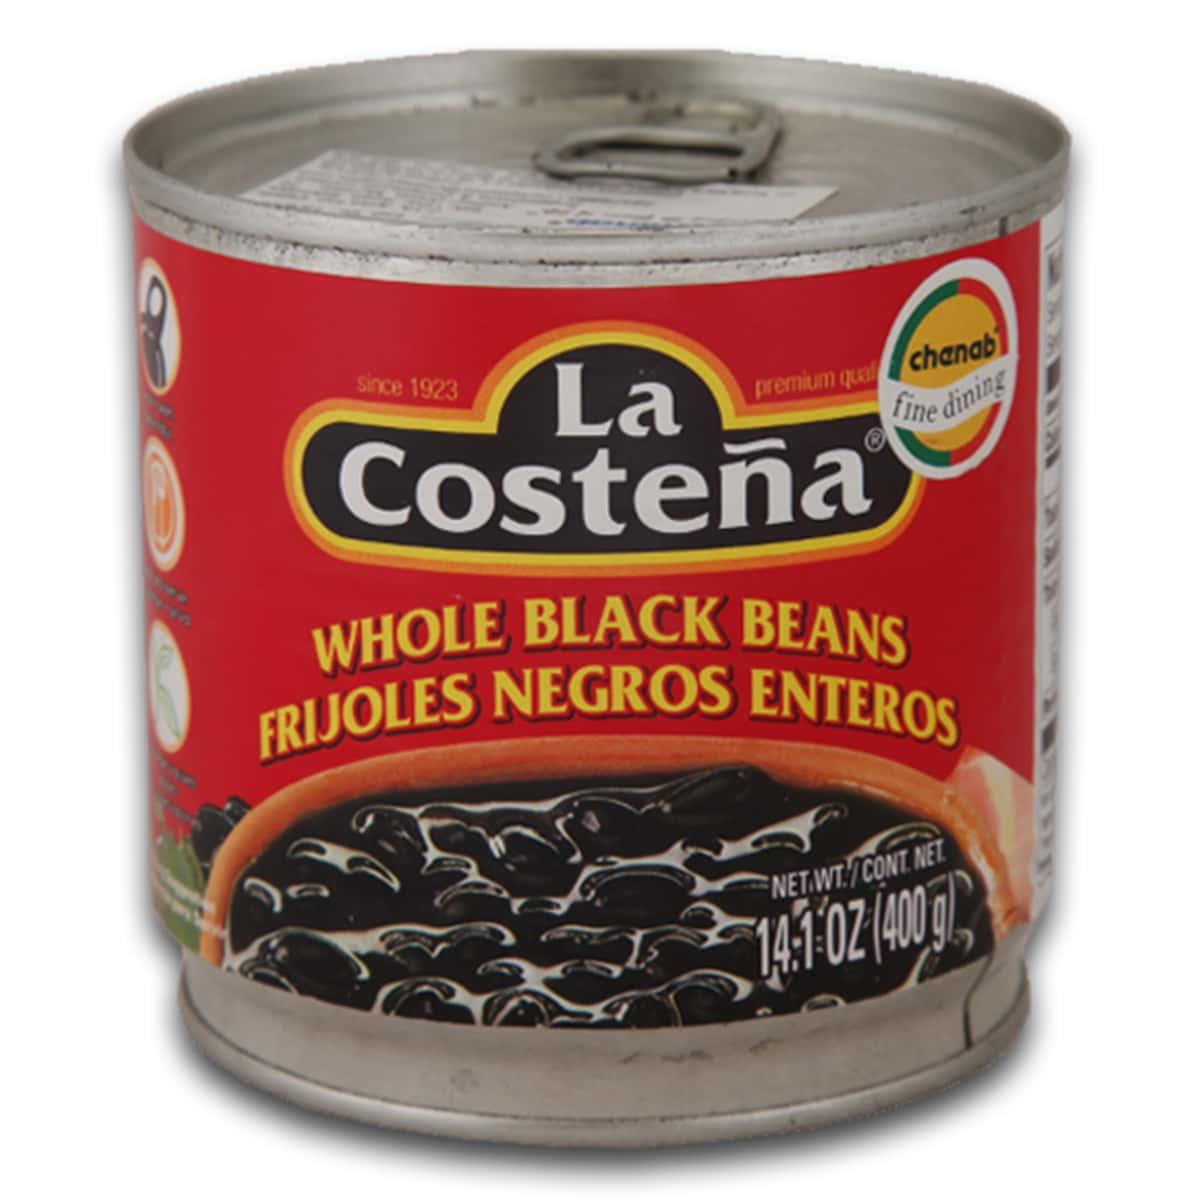 Buy La Costena Whole Black Beans (Frijoles Negros Enteros) - 400 gm